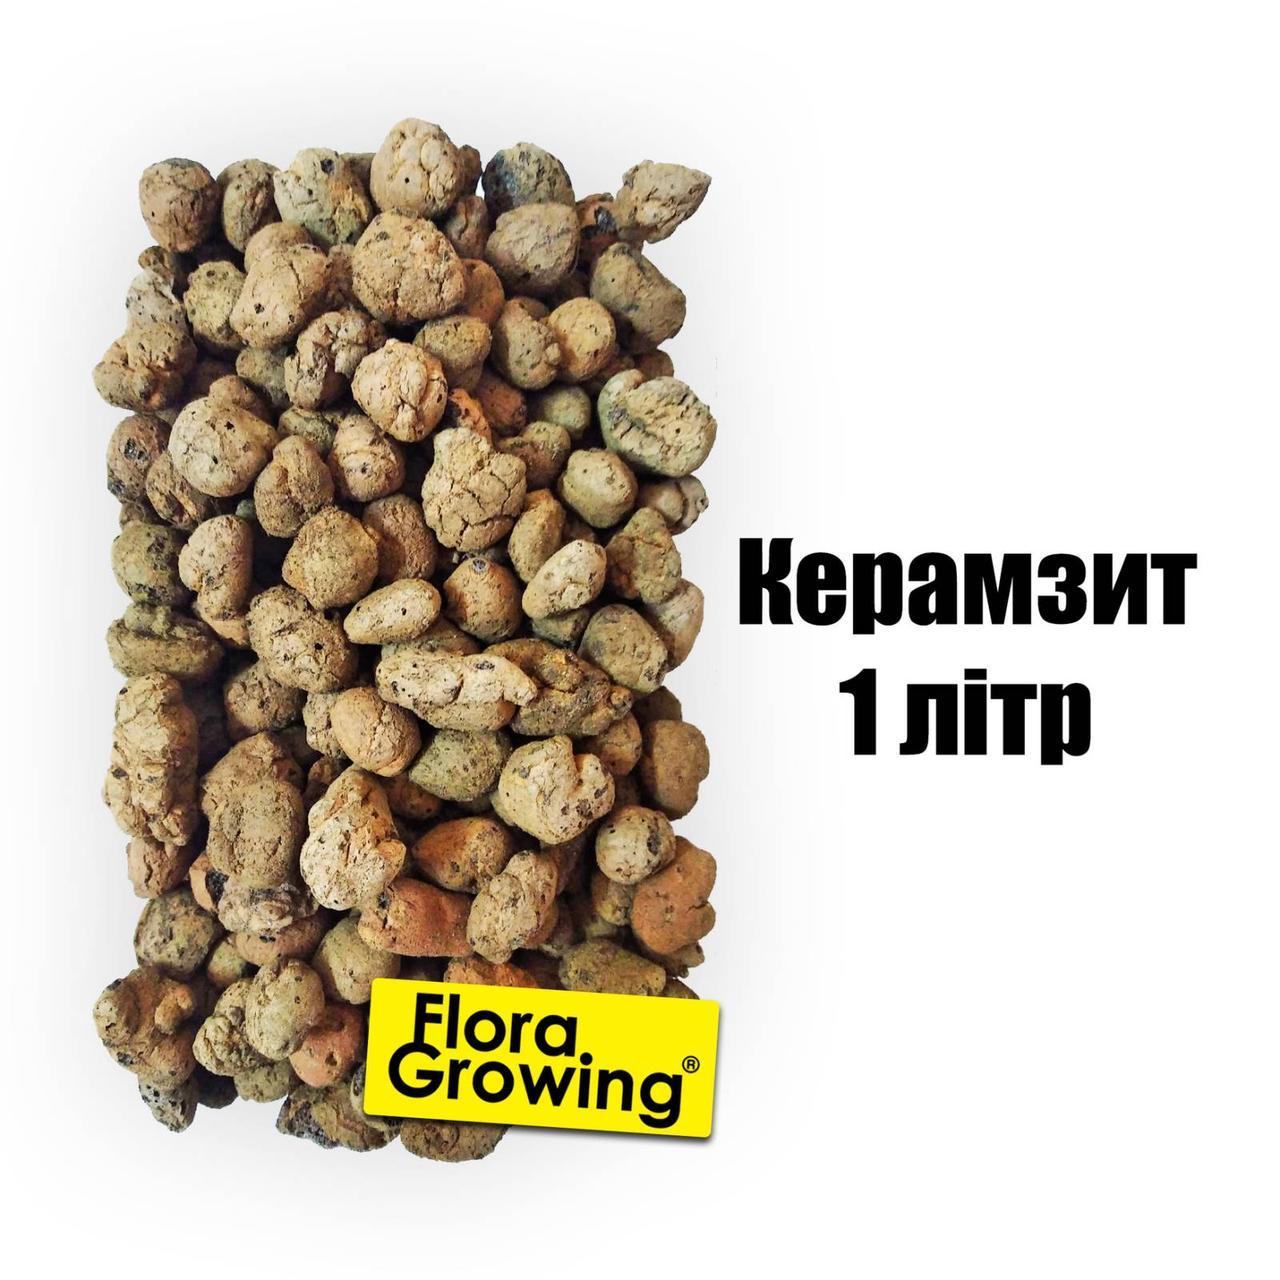 1 л Керамзит - средний фр.10-20